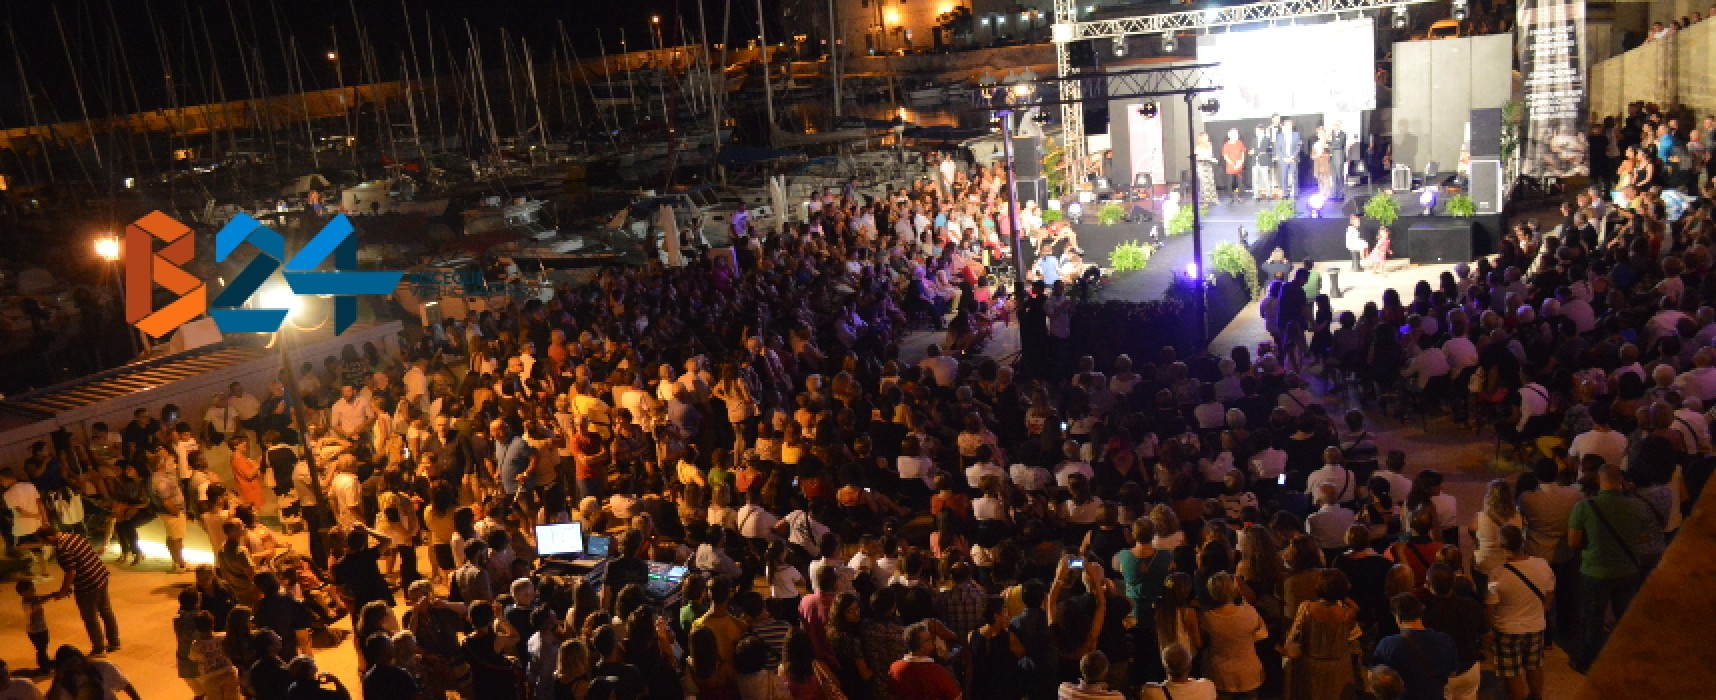 "VIII edizione ""Capelli in festa"", trionfo di acconciature e solidarietà / FOTO"